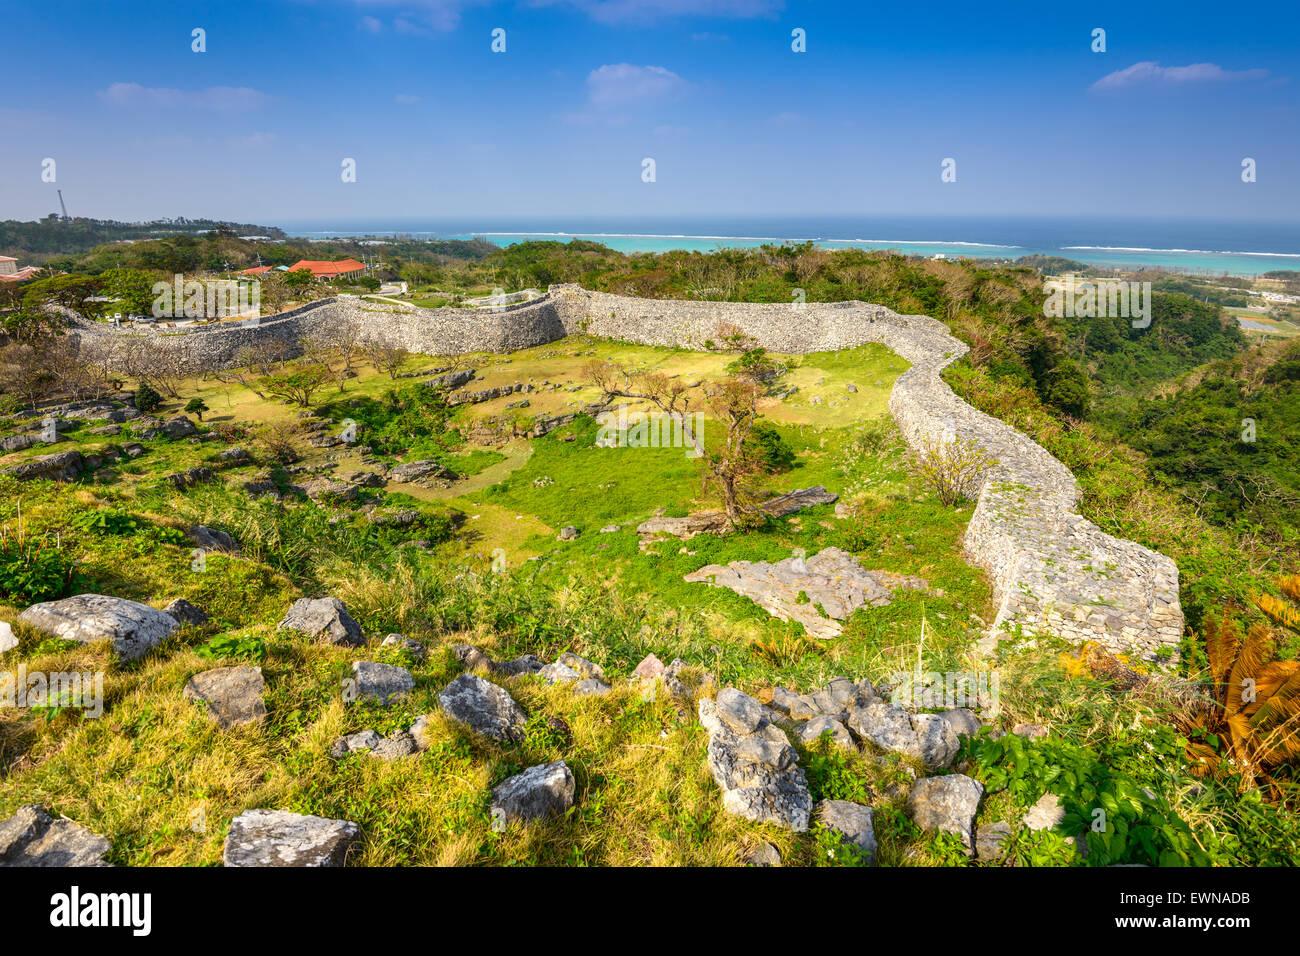 Okinawa, Japón en ruinas del castillo Nakagusuku. Imagen De Stock